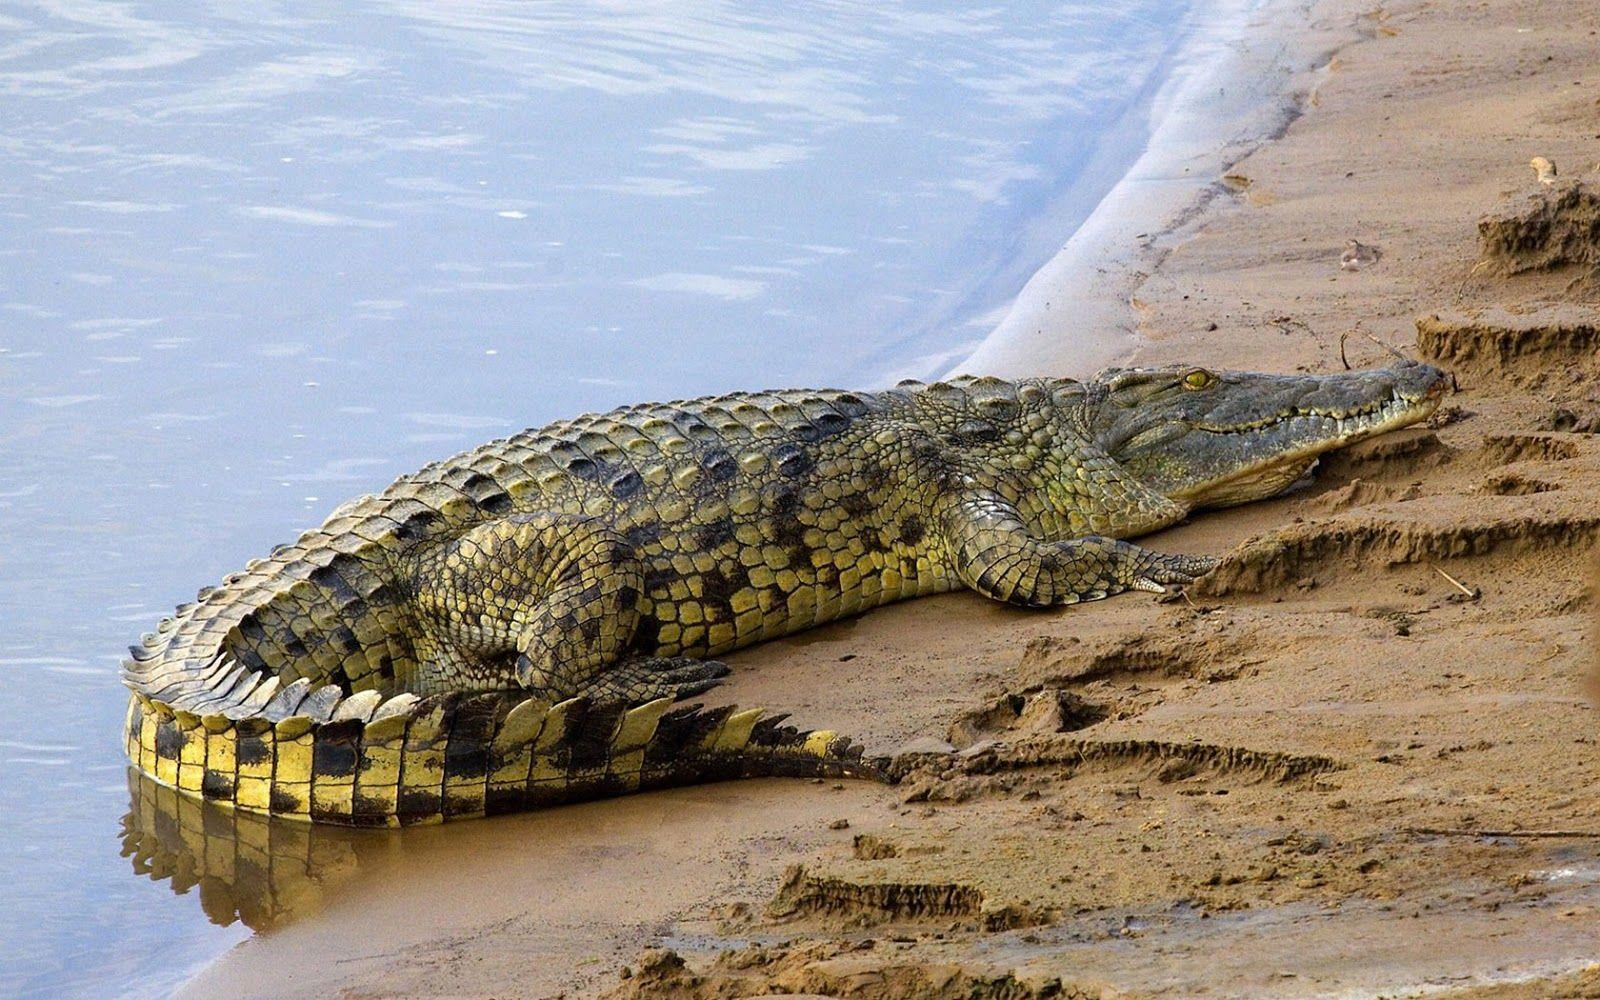 black alligator wallpaper hd